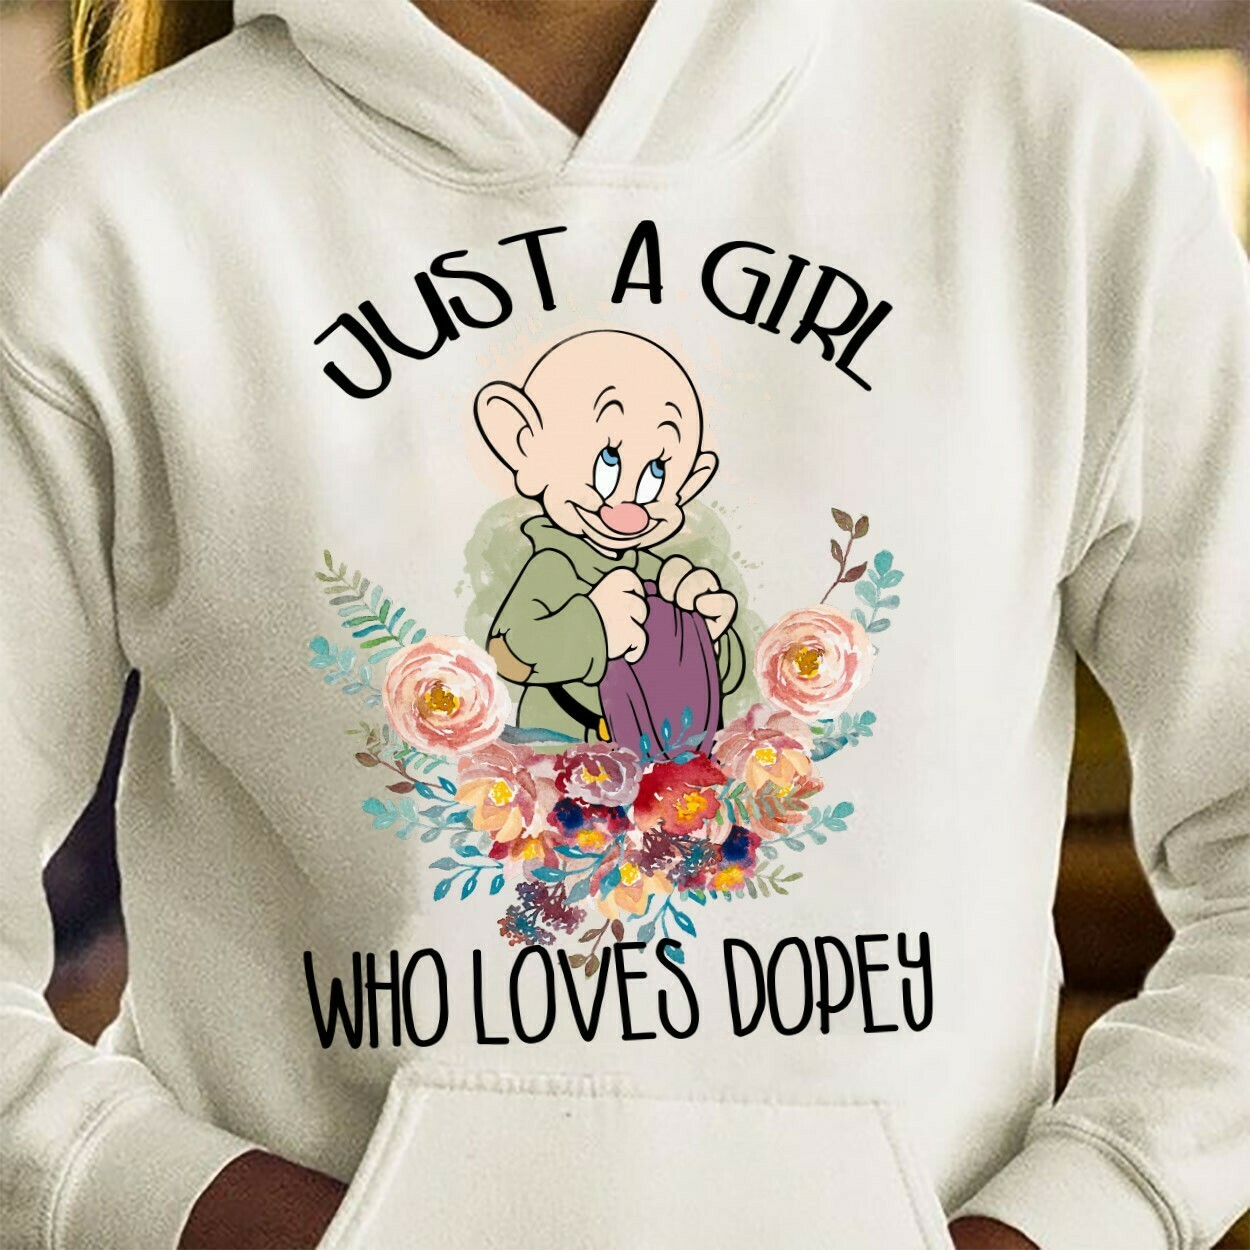 Dopey Dwarf Just A Girl Who Love Dopey,Snow White and the Seven Dwarfs,Walt Disney World,Disney Grumpy Old Man,Dopey Seven Dwarfs T Shirt Long Sleeve Sweatshirt Hoodie Jolly Family Gifts